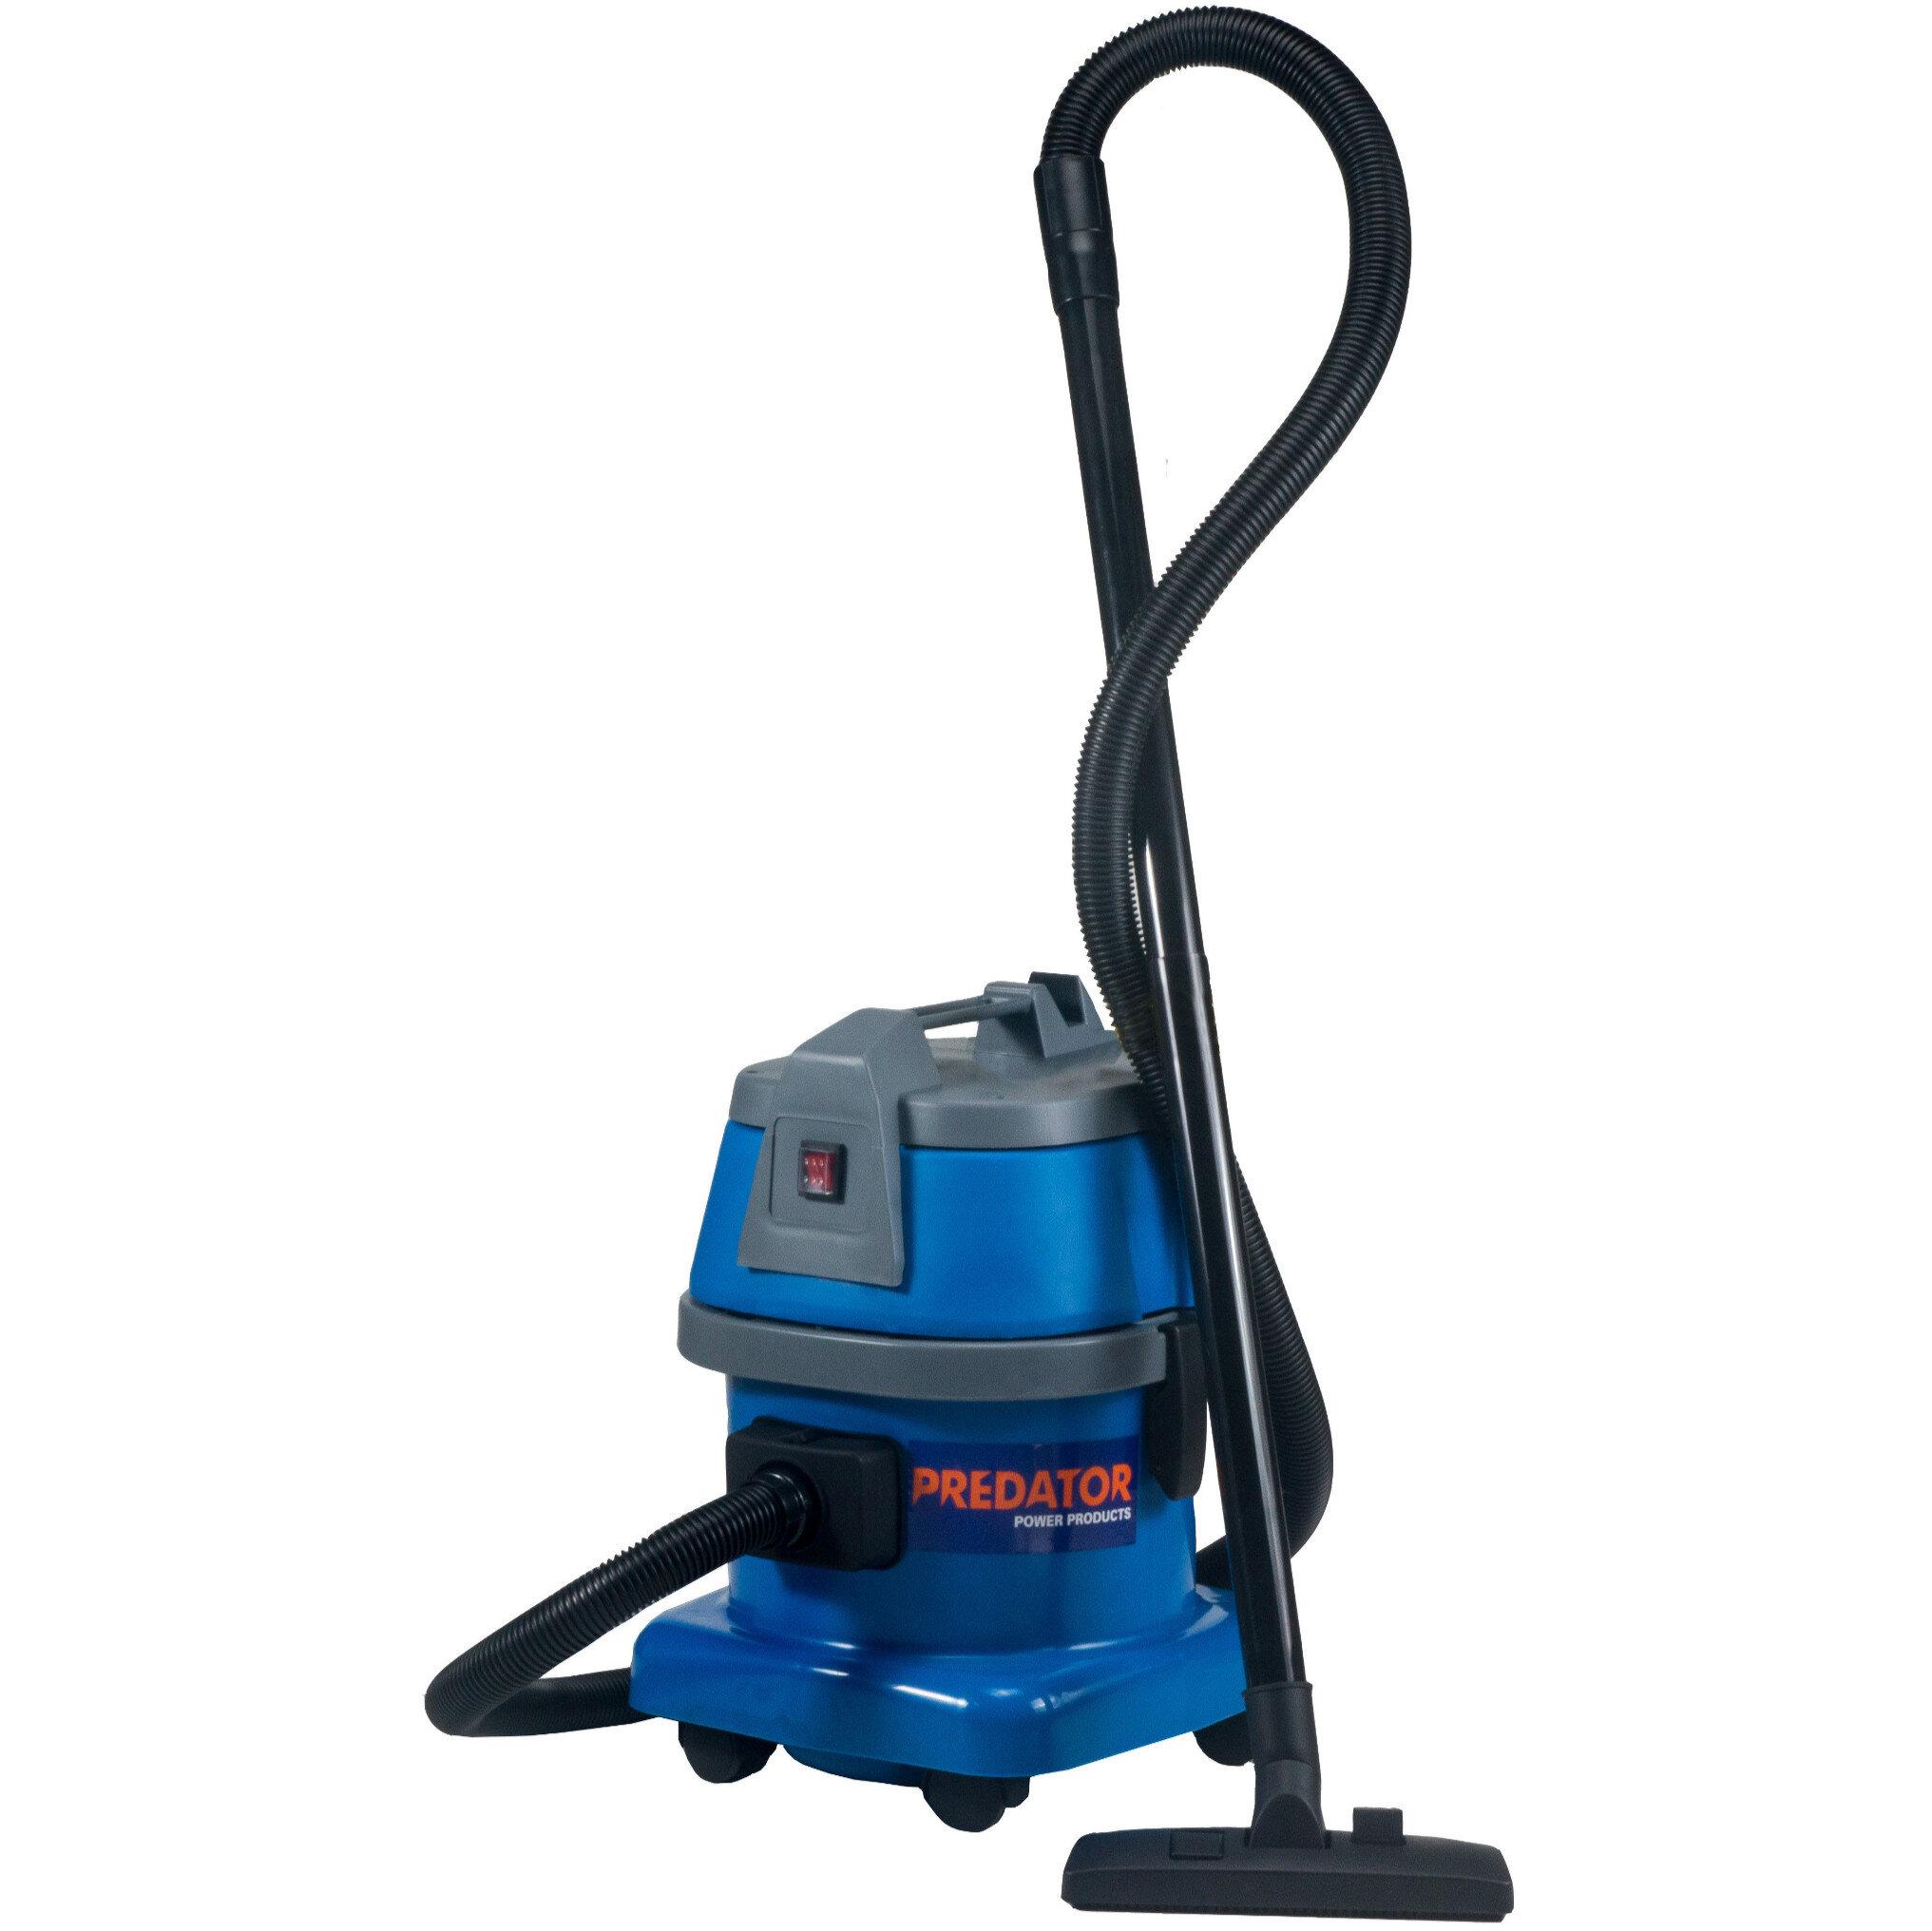 PREDATOR Light Industrial WET/DRY 15 Litre Vacuum Cleaner